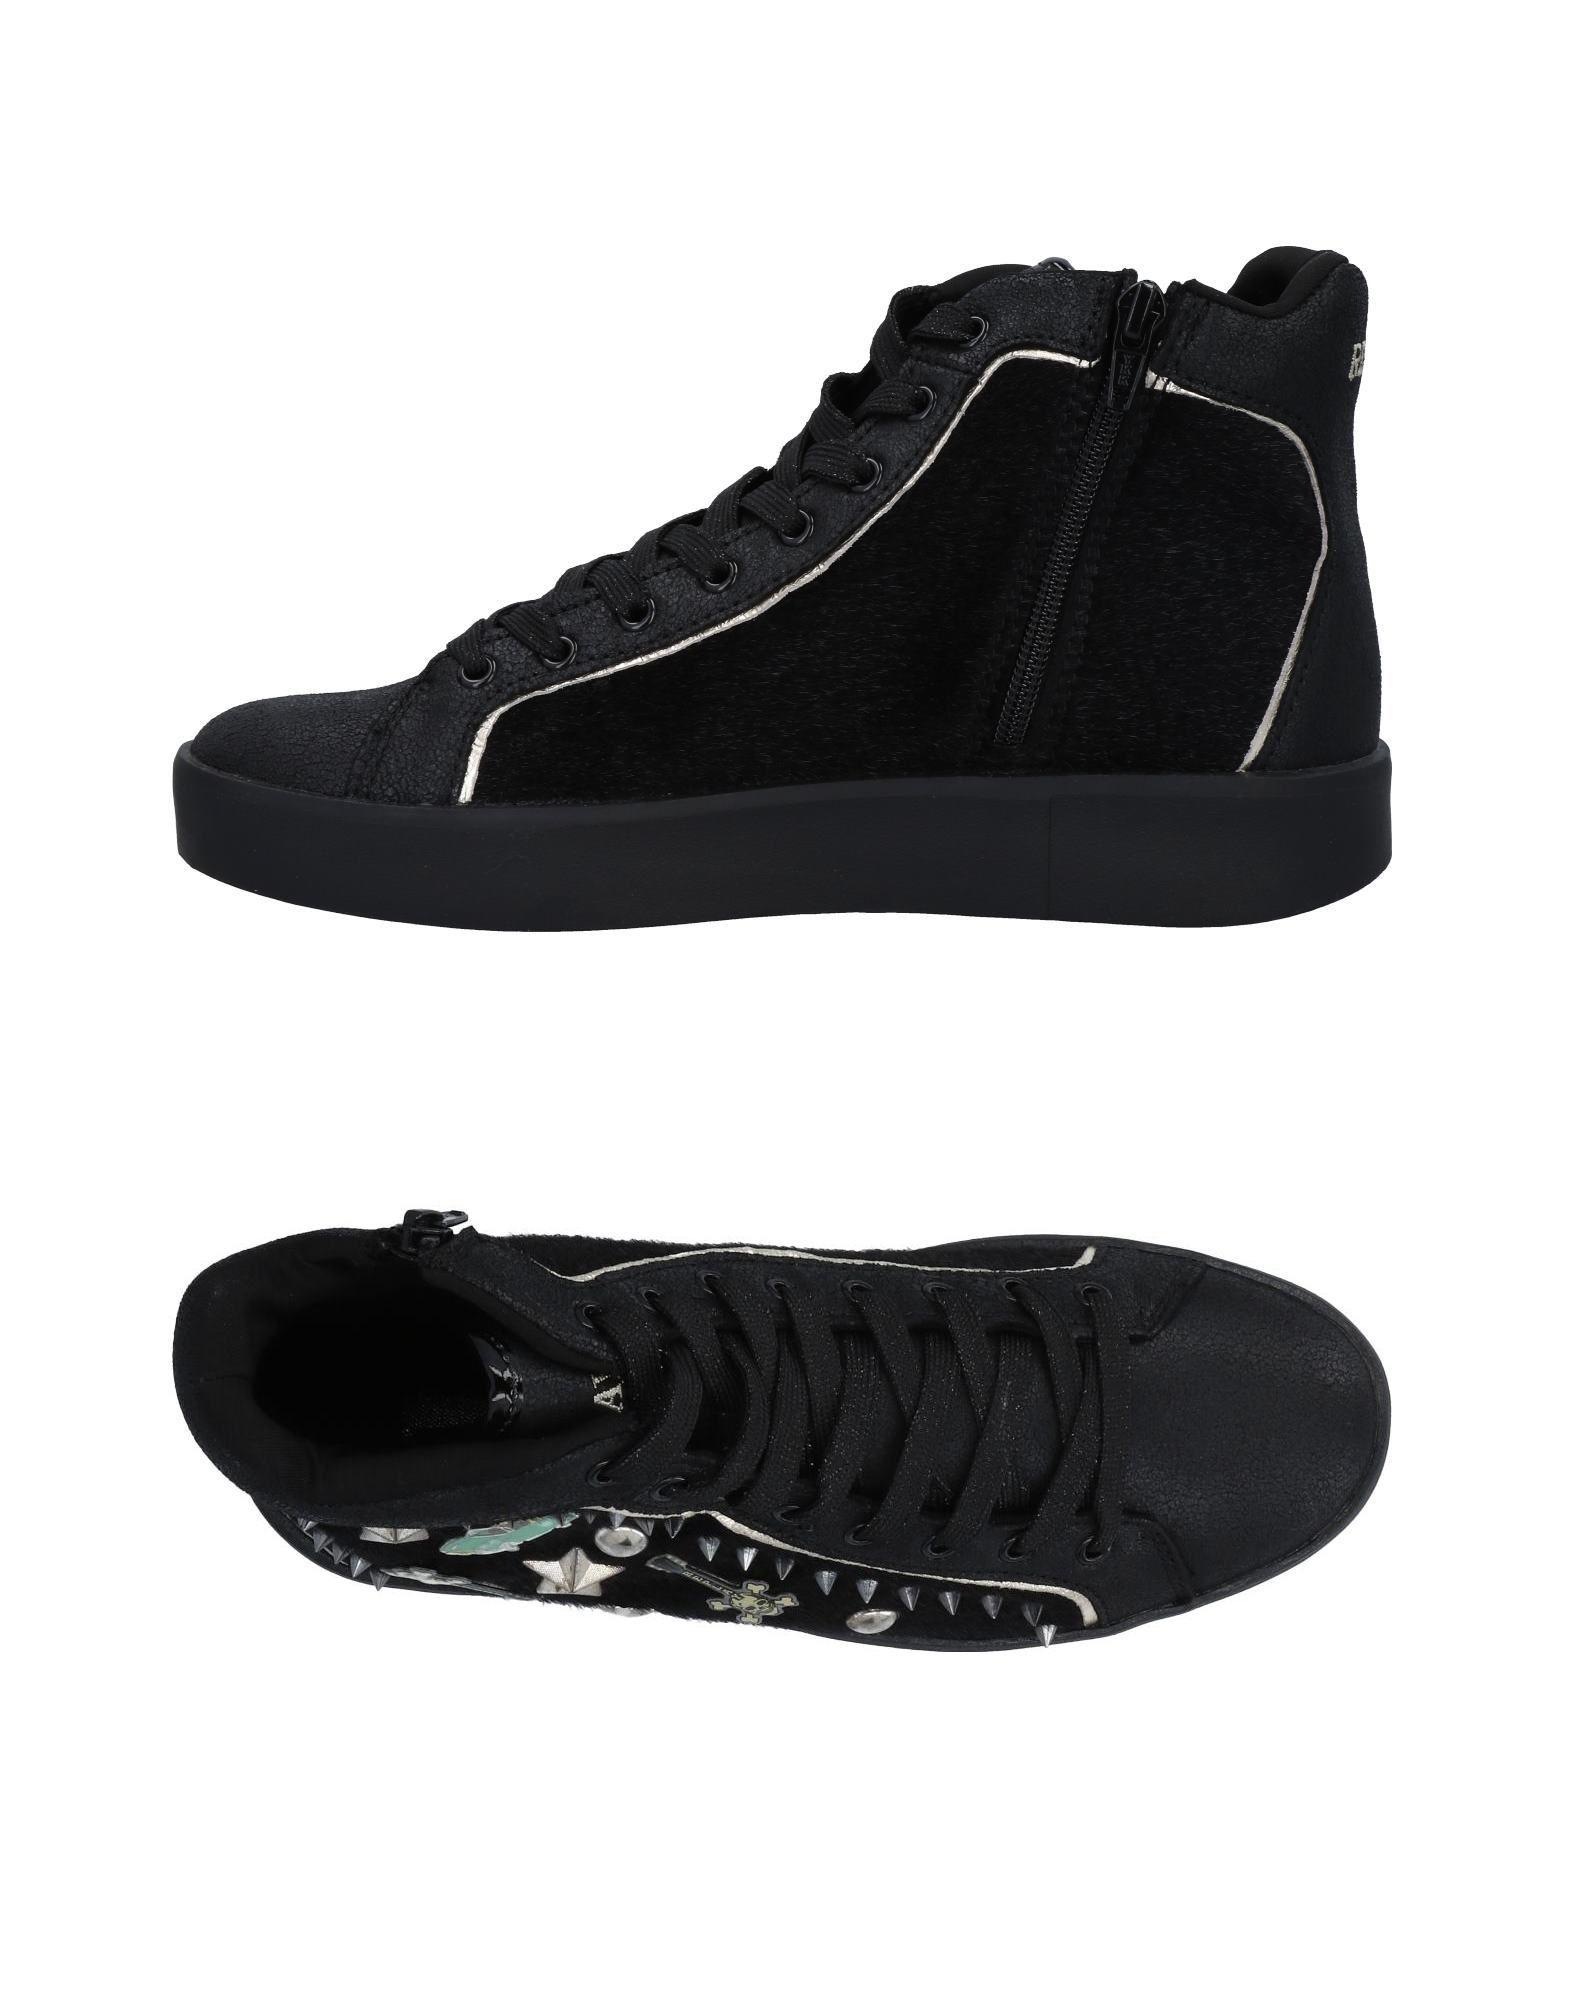 Moda 11493456LG Sneakers Replay Donna - 11493456LG Moda 079e2a